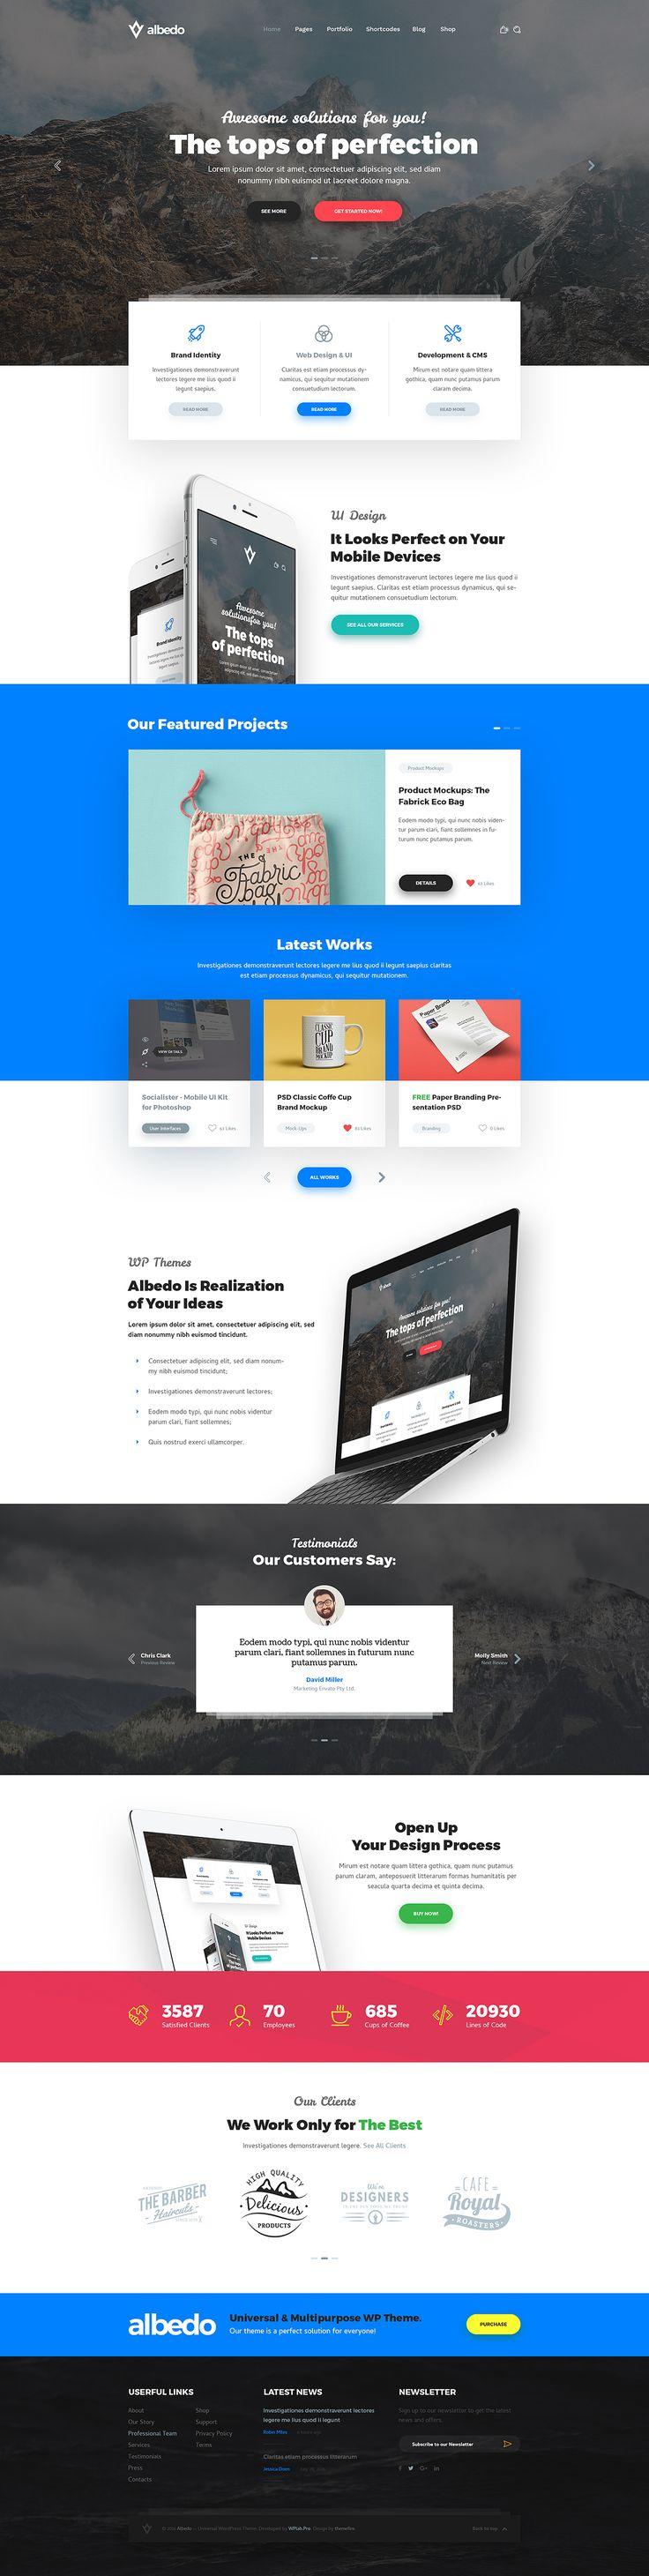 Albedo - Modern Design Studio PSD Template by themefire | ThemeForest